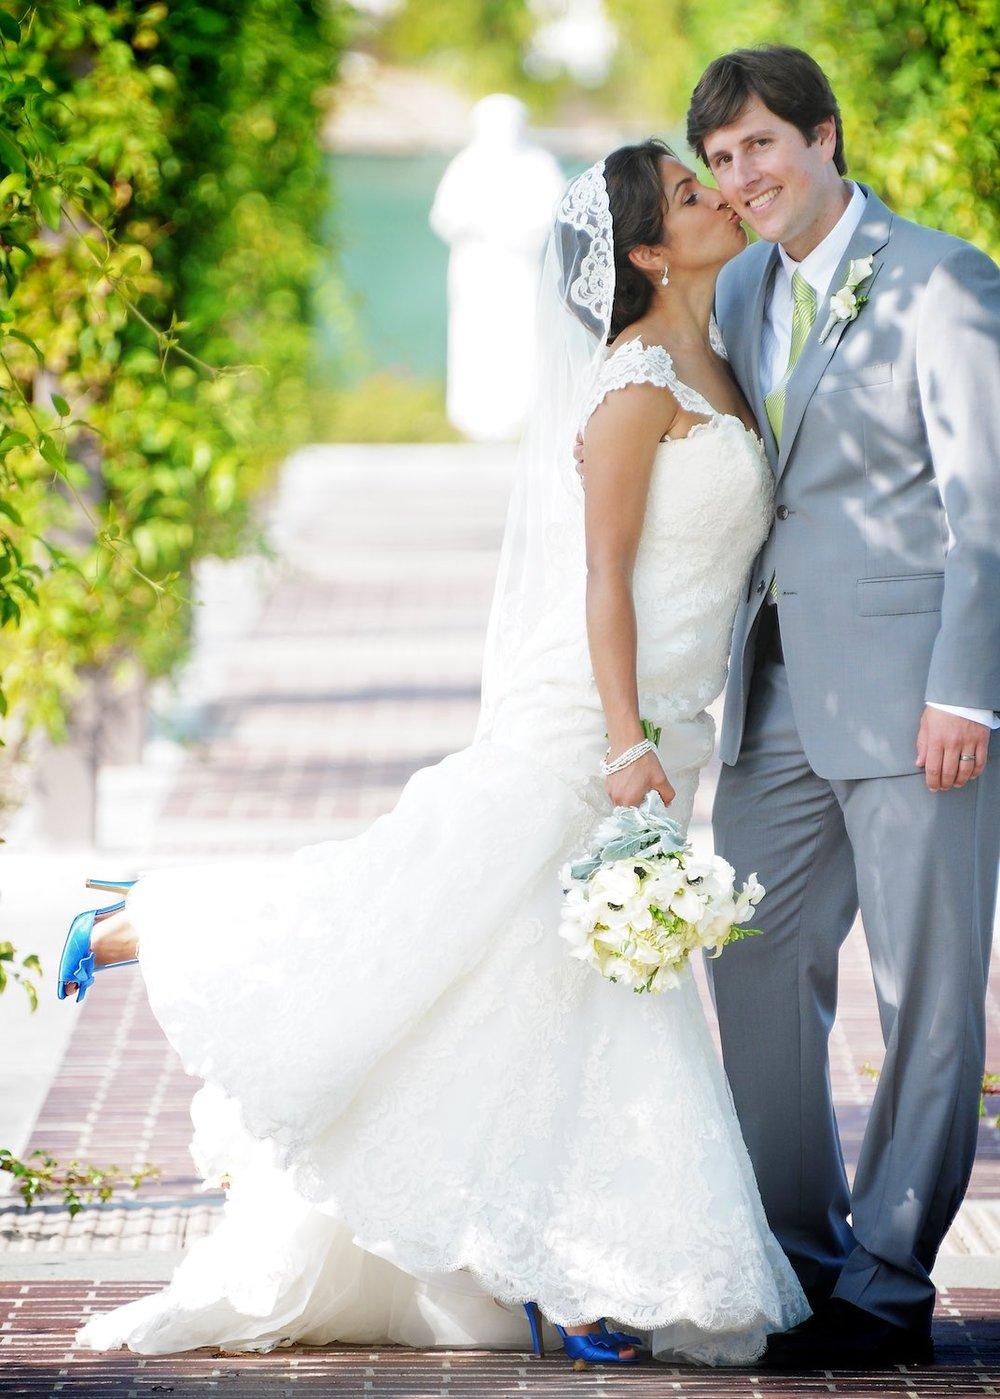 irvine-wedding-michal-pfeil-22.jpg